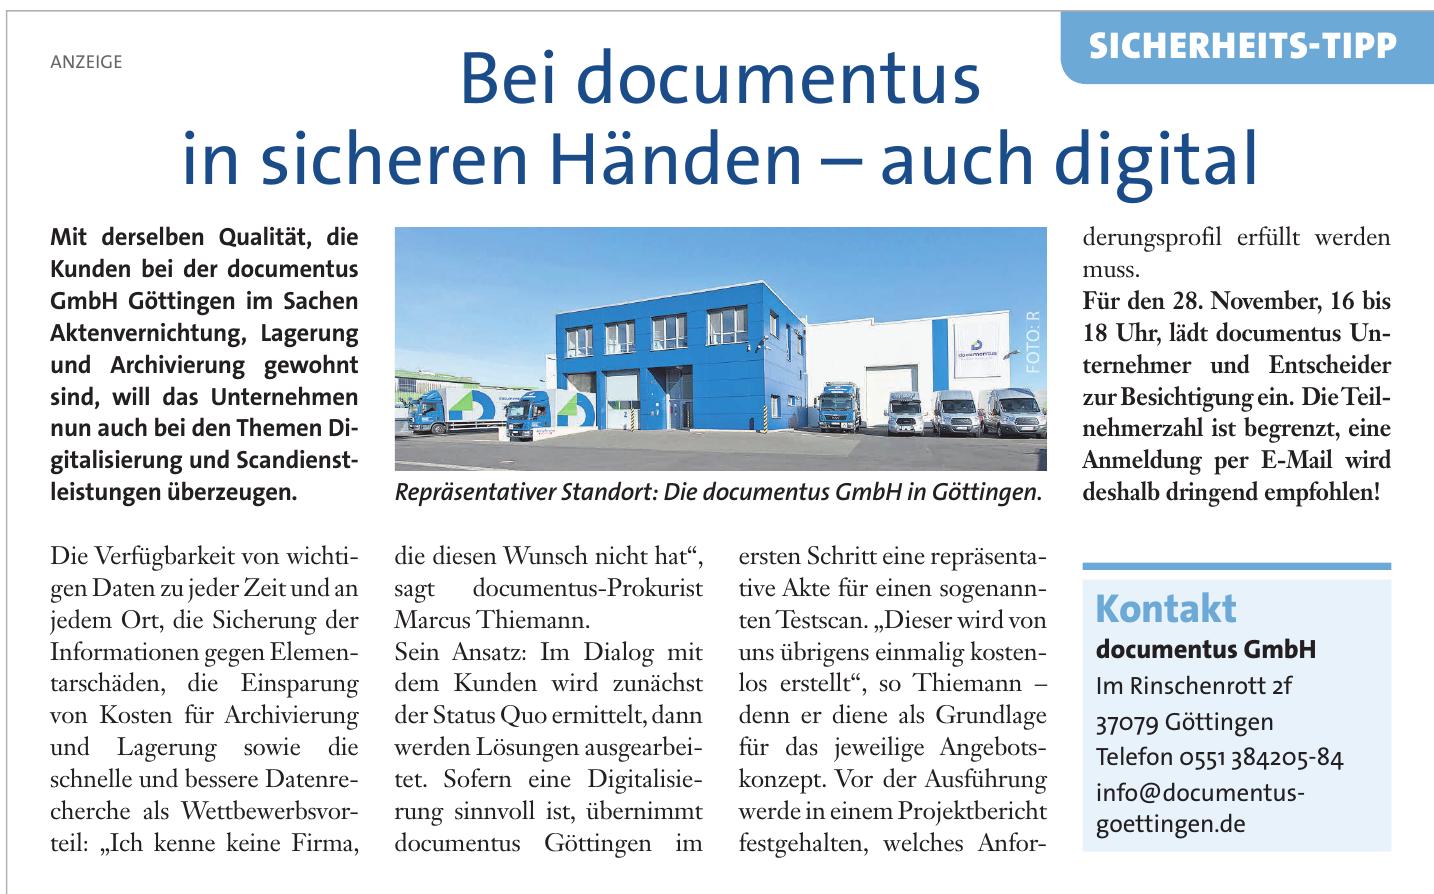 documentus GmbH